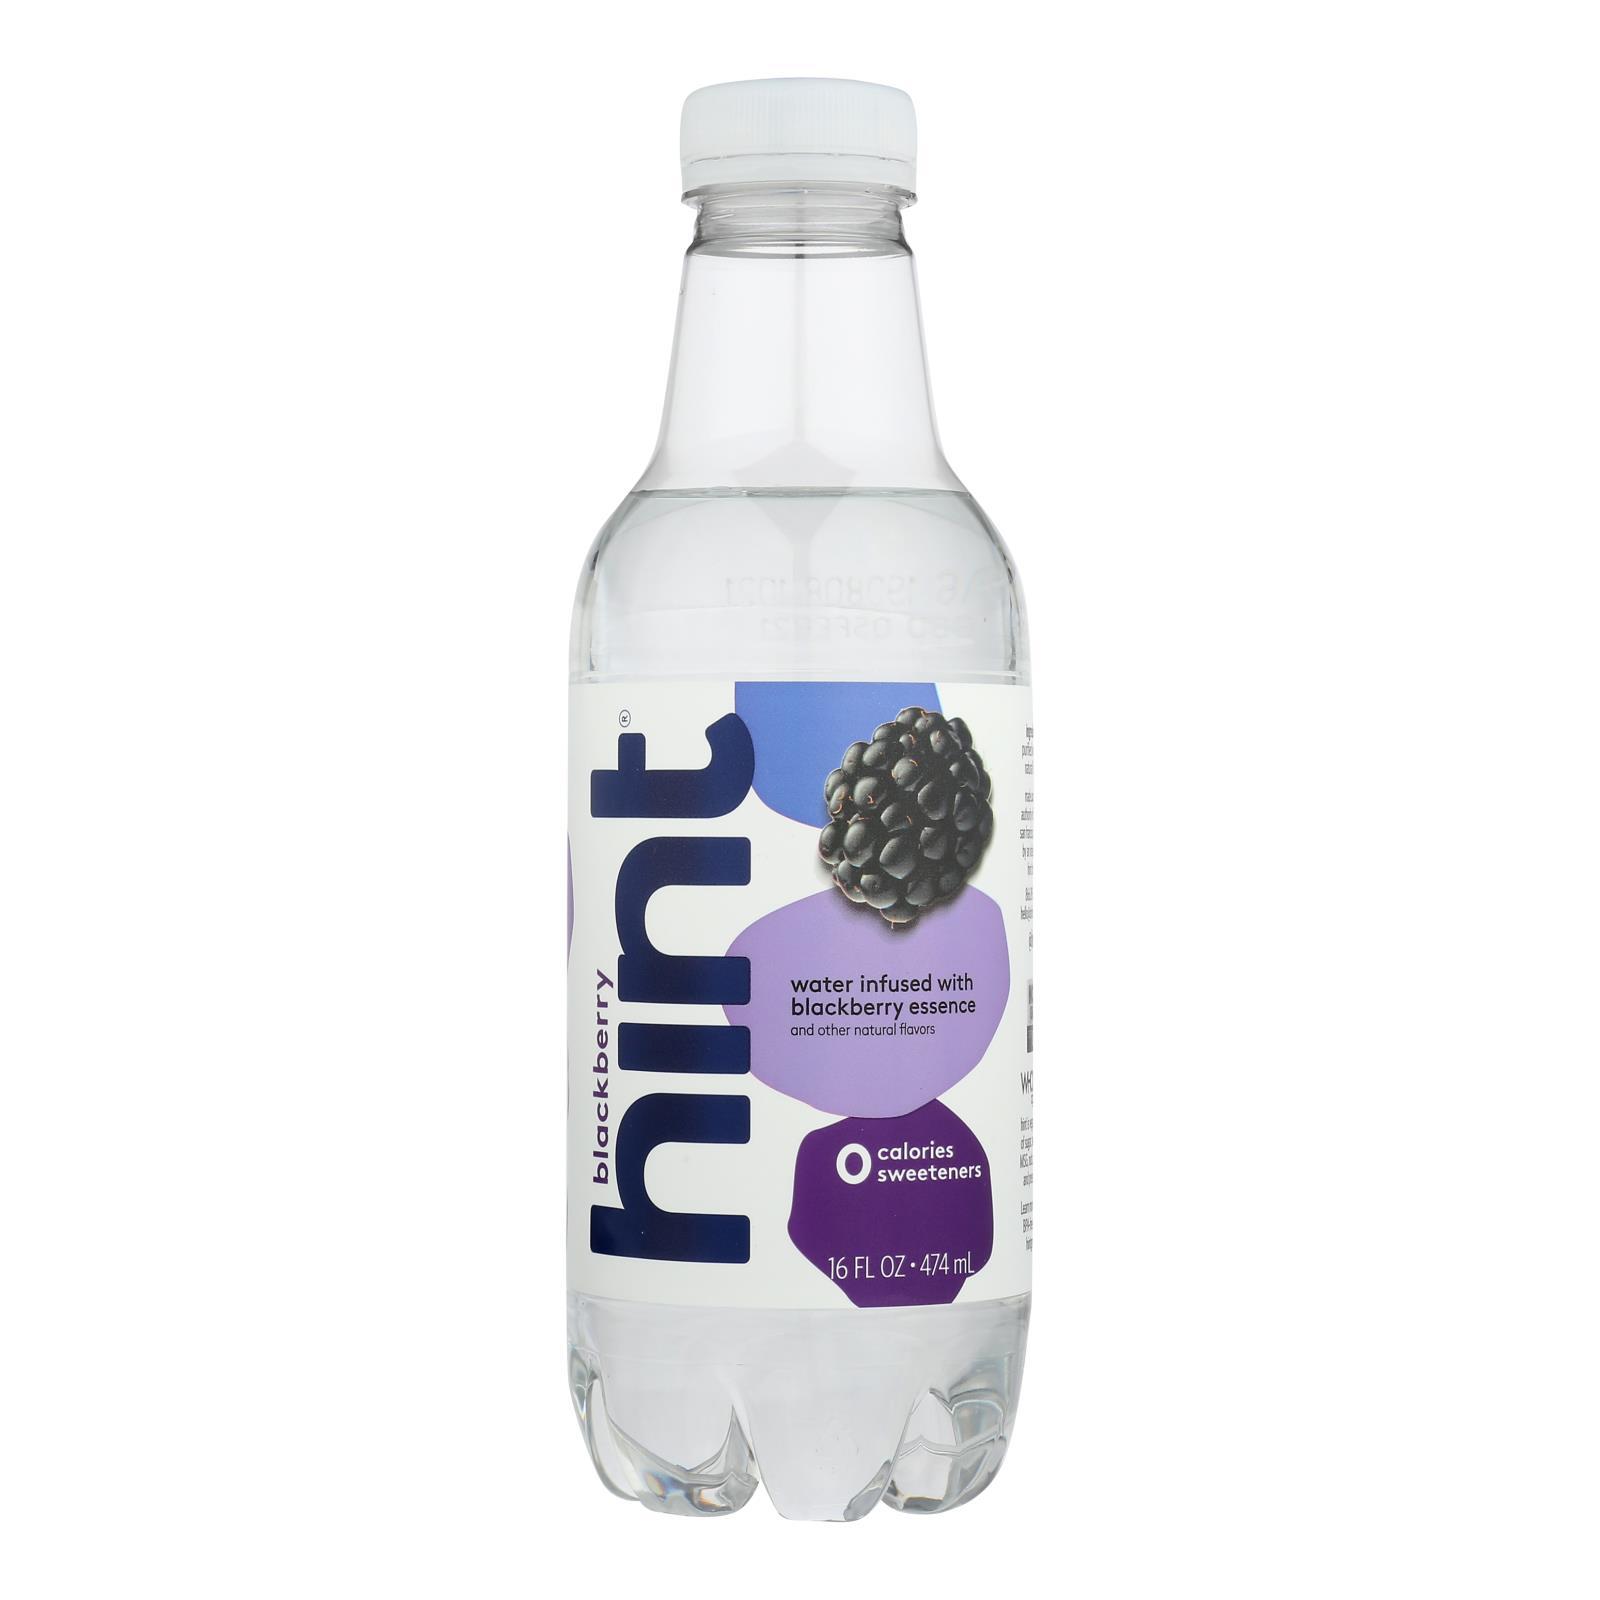 Hint Blackberry Water - Blackberry - Case of 12 - 16 Fl oz.